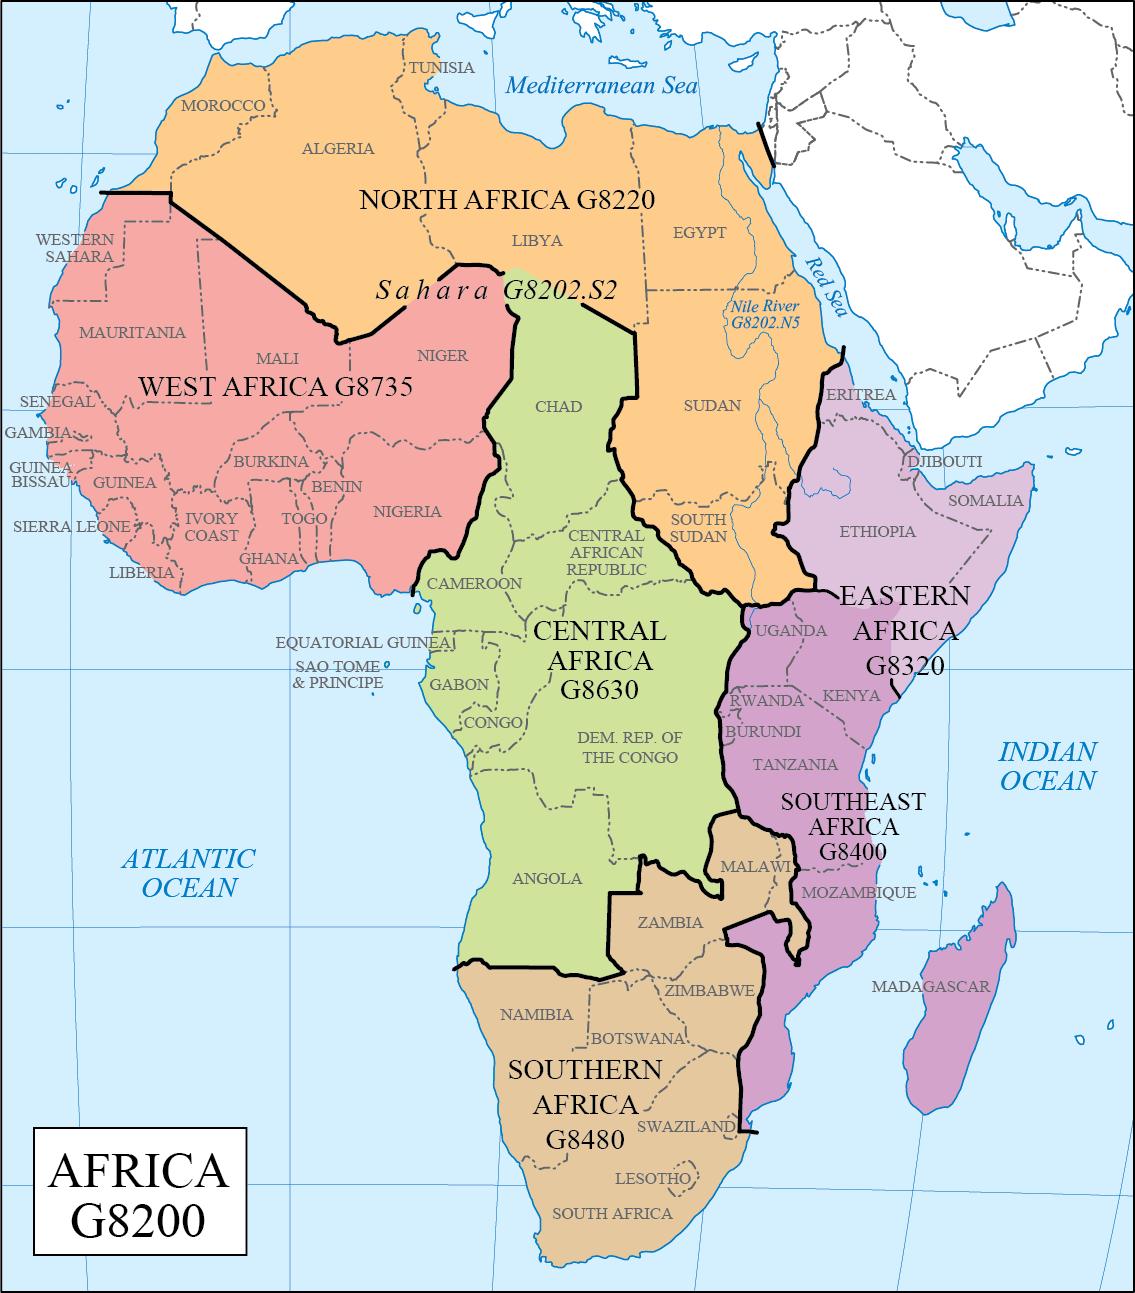 Africa Regions Map LC G Schedule Map 33: Africa Regions | WAML Information Bulletin